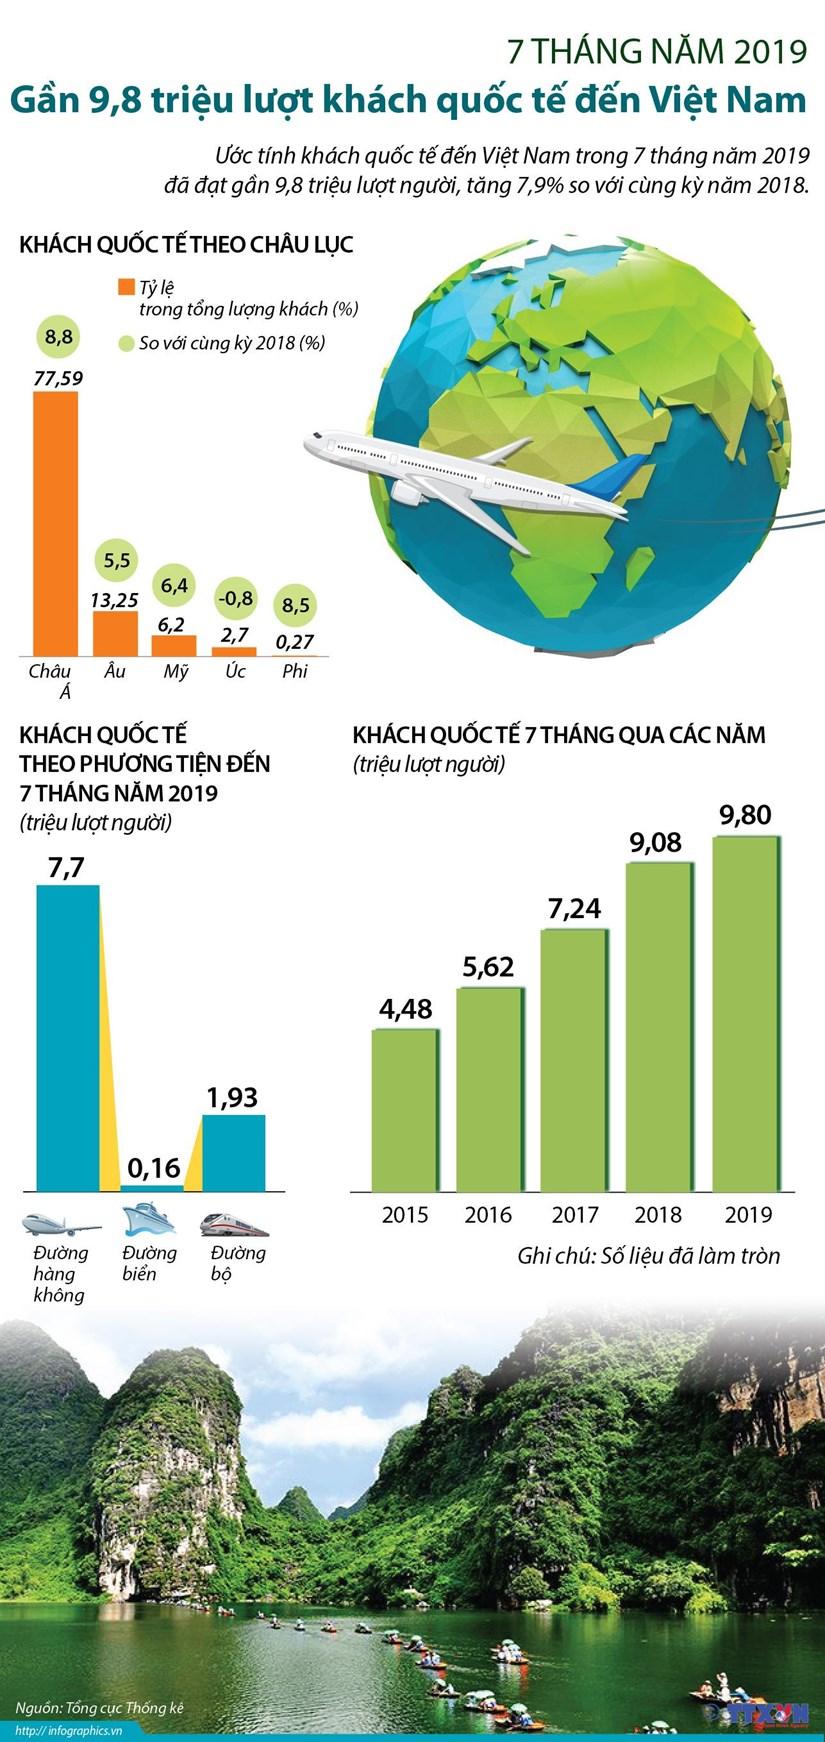 [Infographics] 9,8 trieu luot khach quoc te den Viet Nam trong 7 thang hinh anh 1